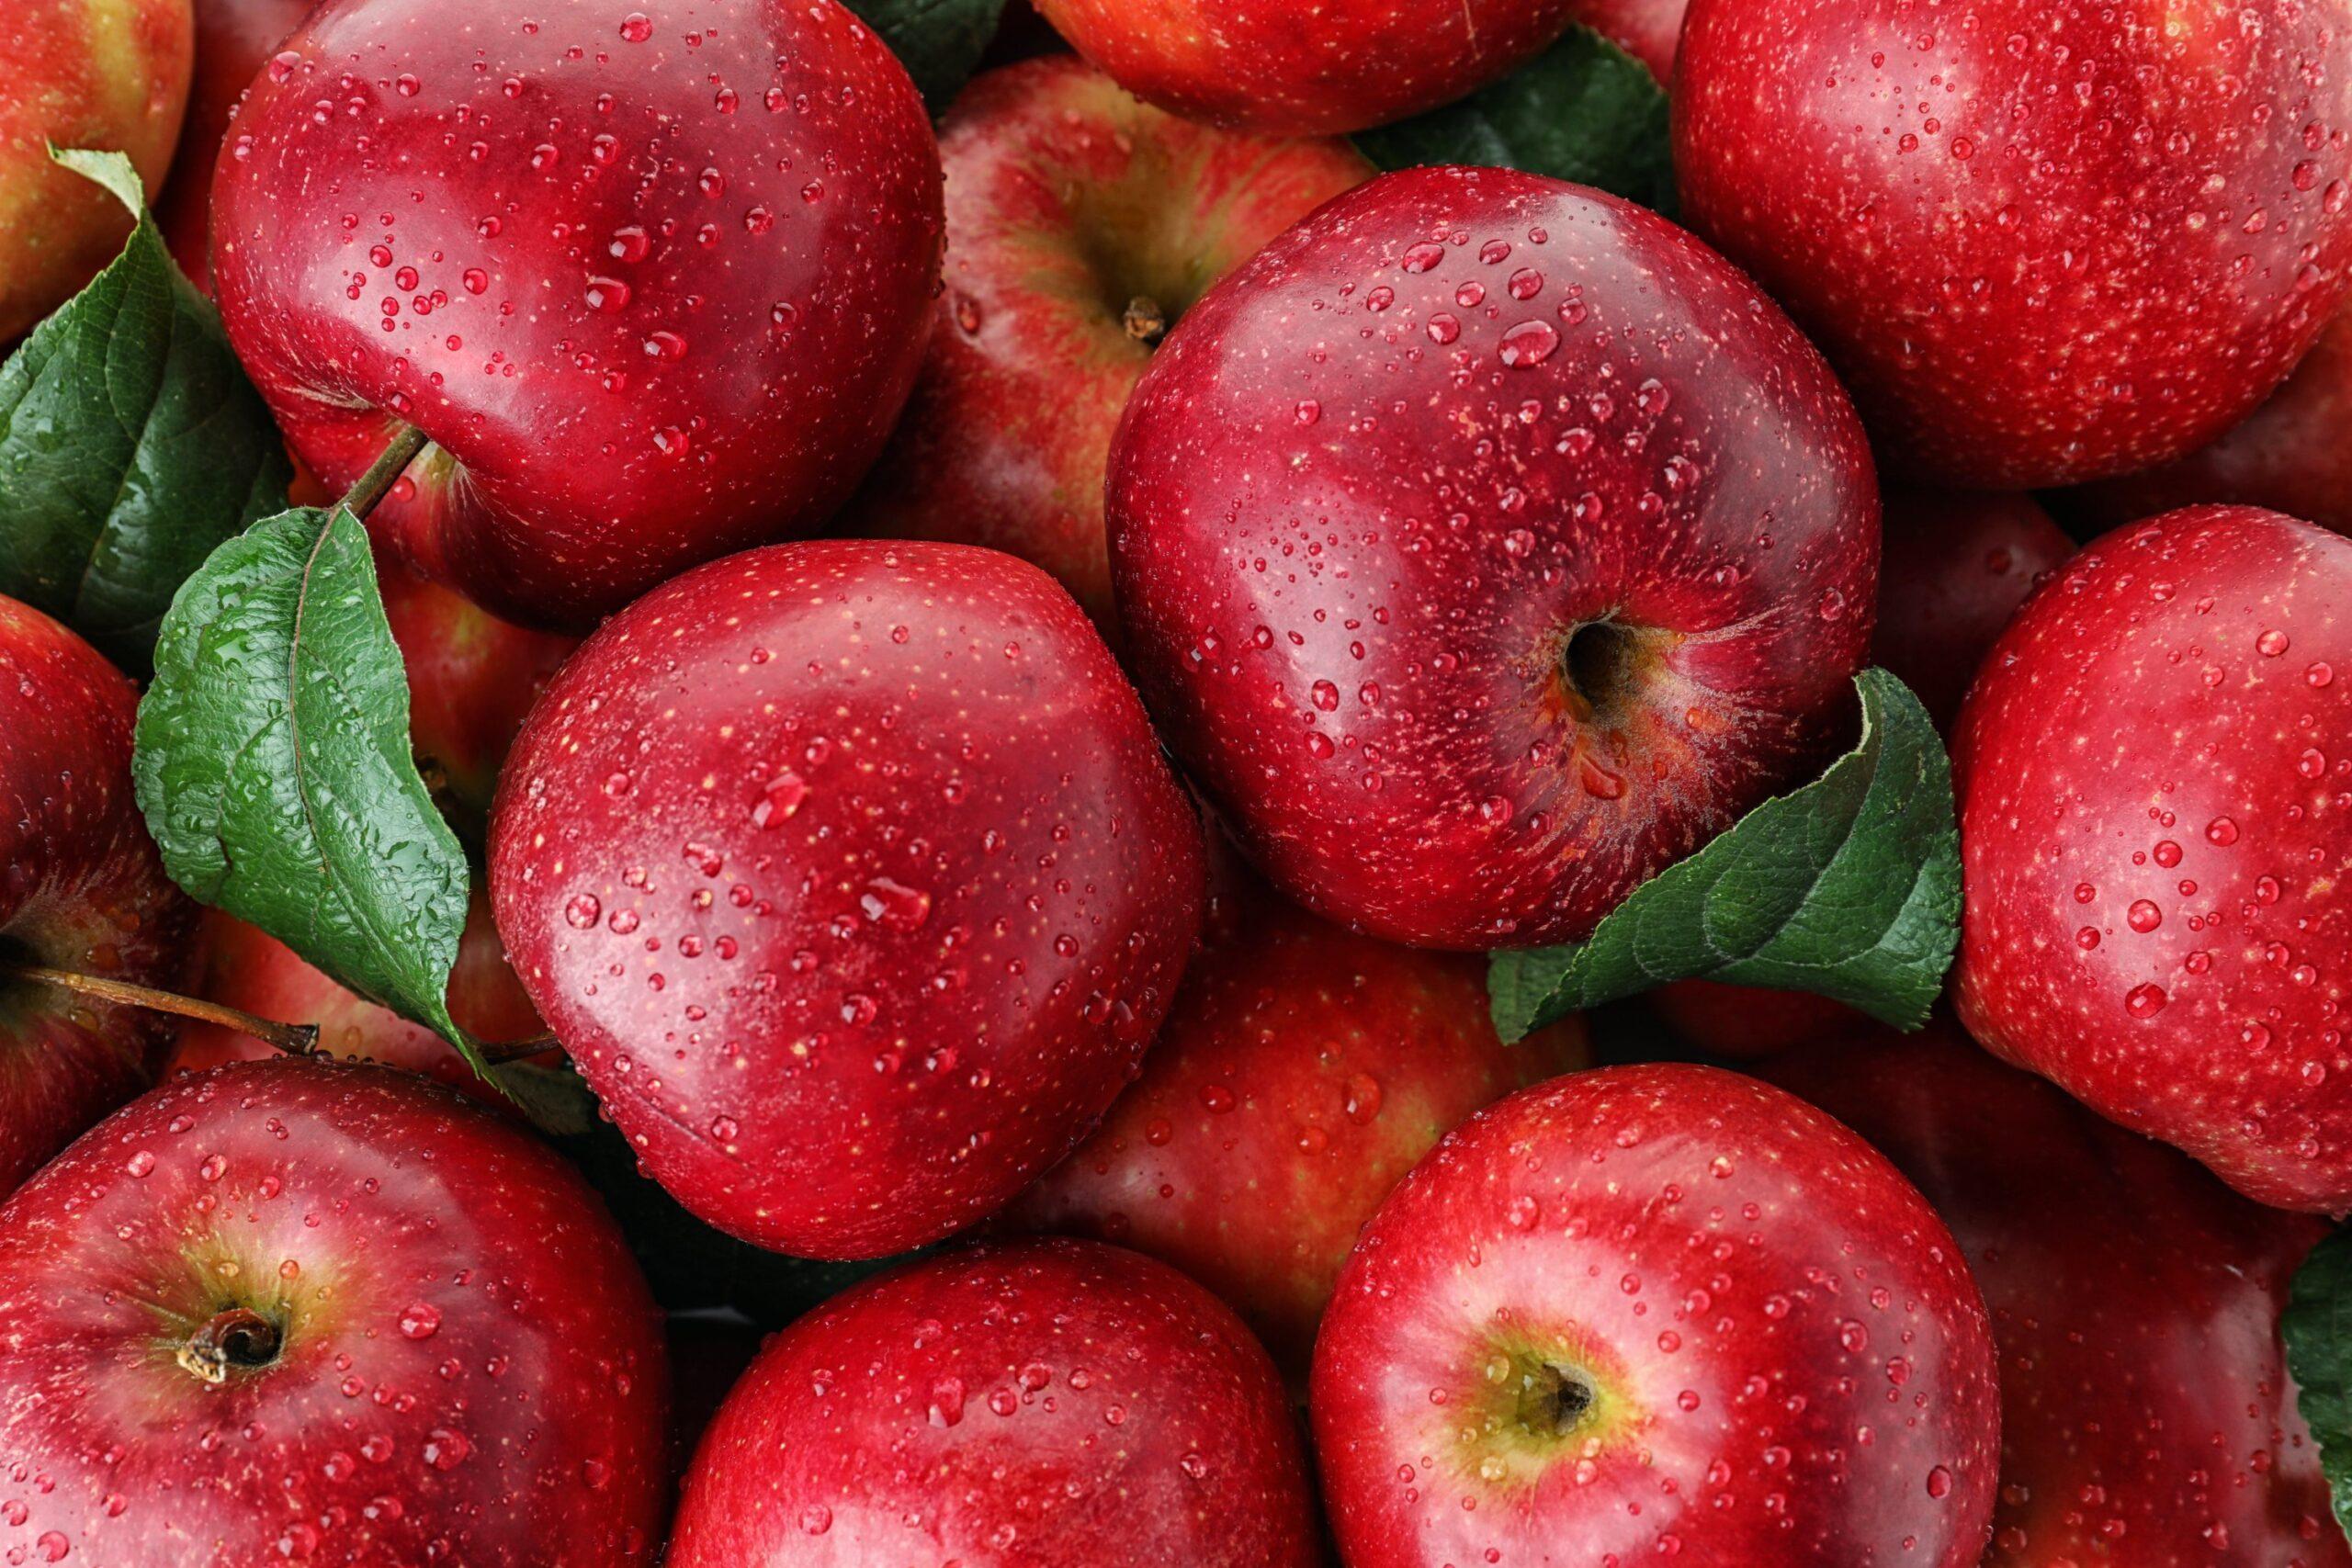 Researchers Find Apples Boost Brain Health